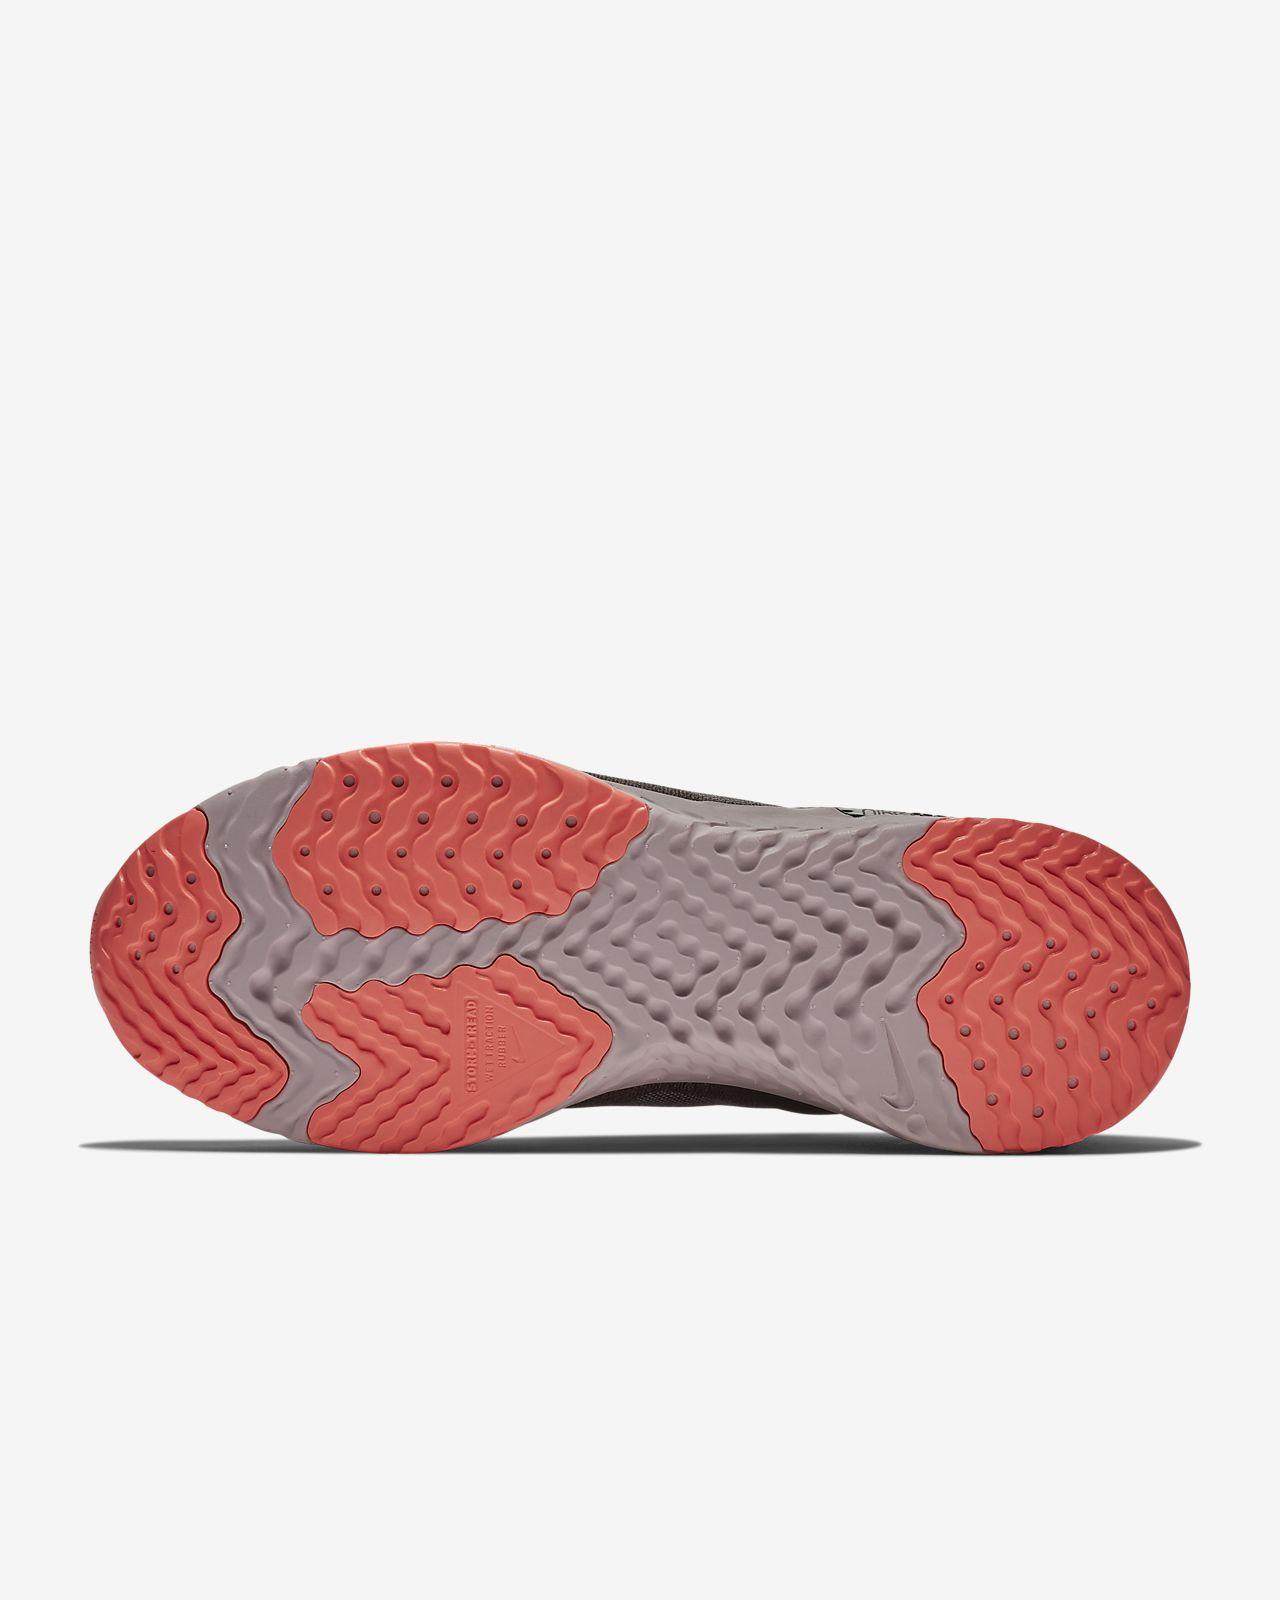 wholesale dealer 8036c feba9 ... Chaussure de running Nike Odyssey React Shield Water-Repellent pour  Femme